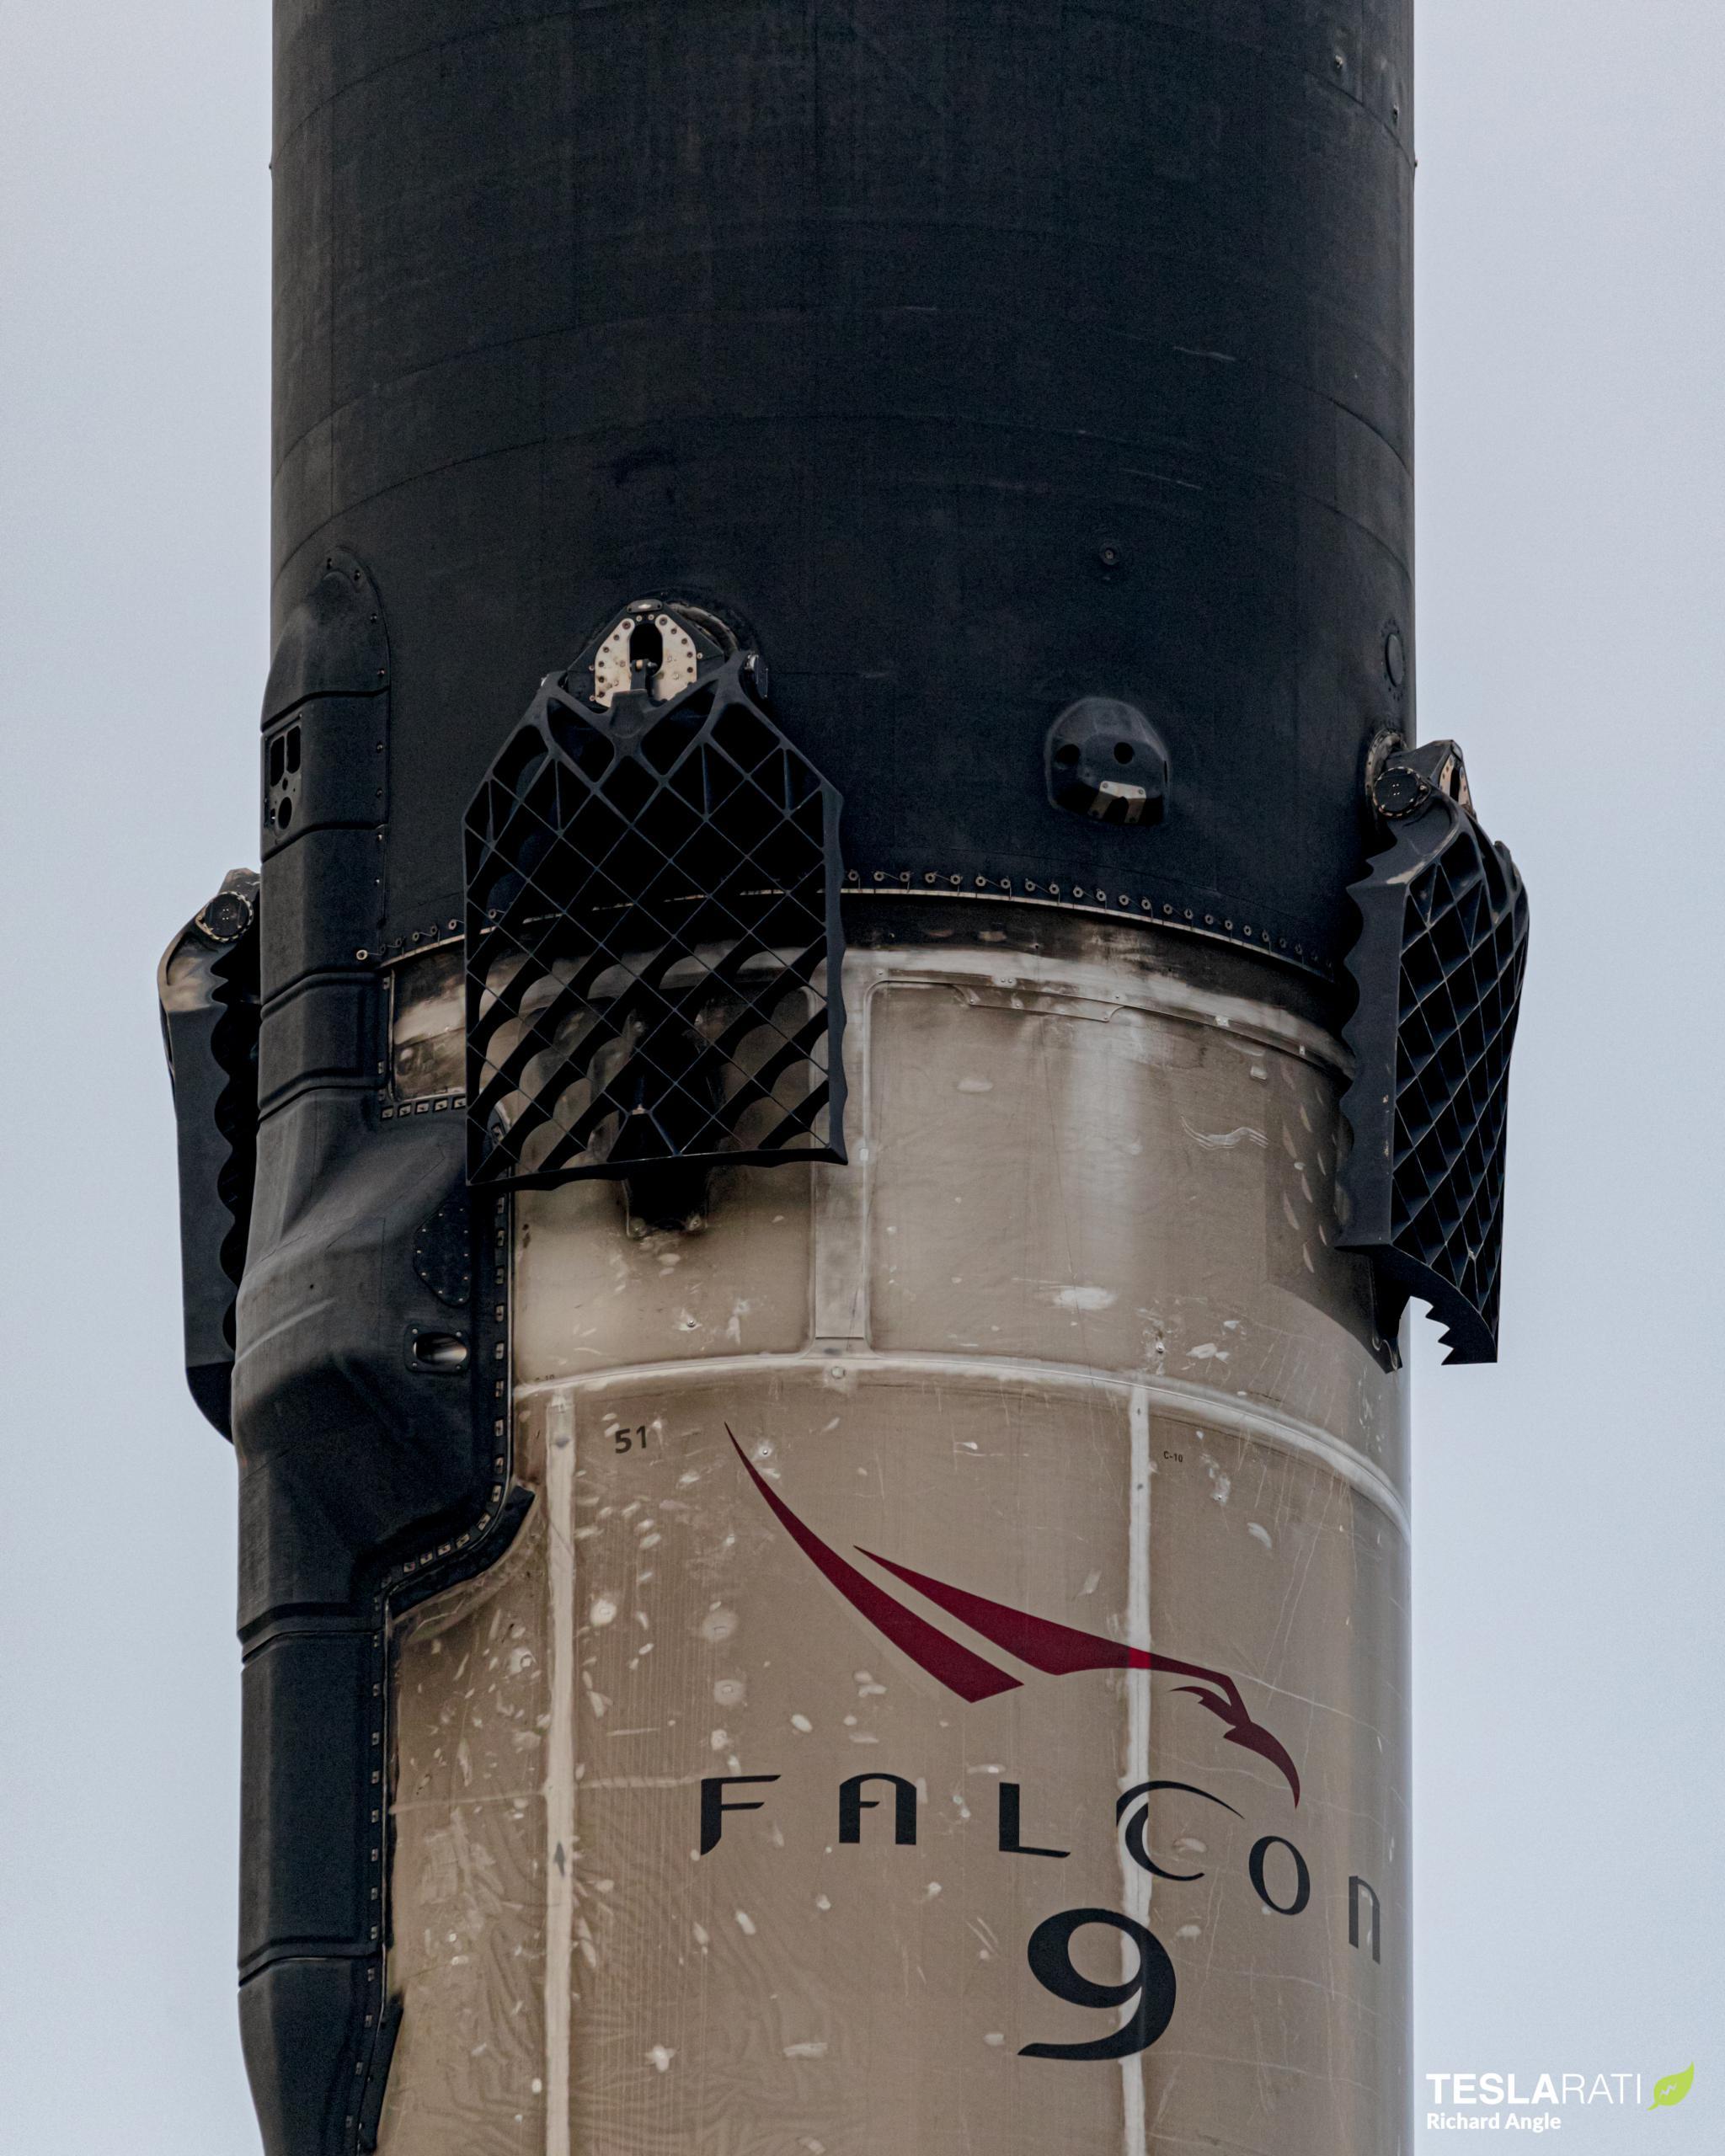 Starlink-13 Falcon 9 B1051 OCISLY return 102120 (Richard Angle) (5) (c)